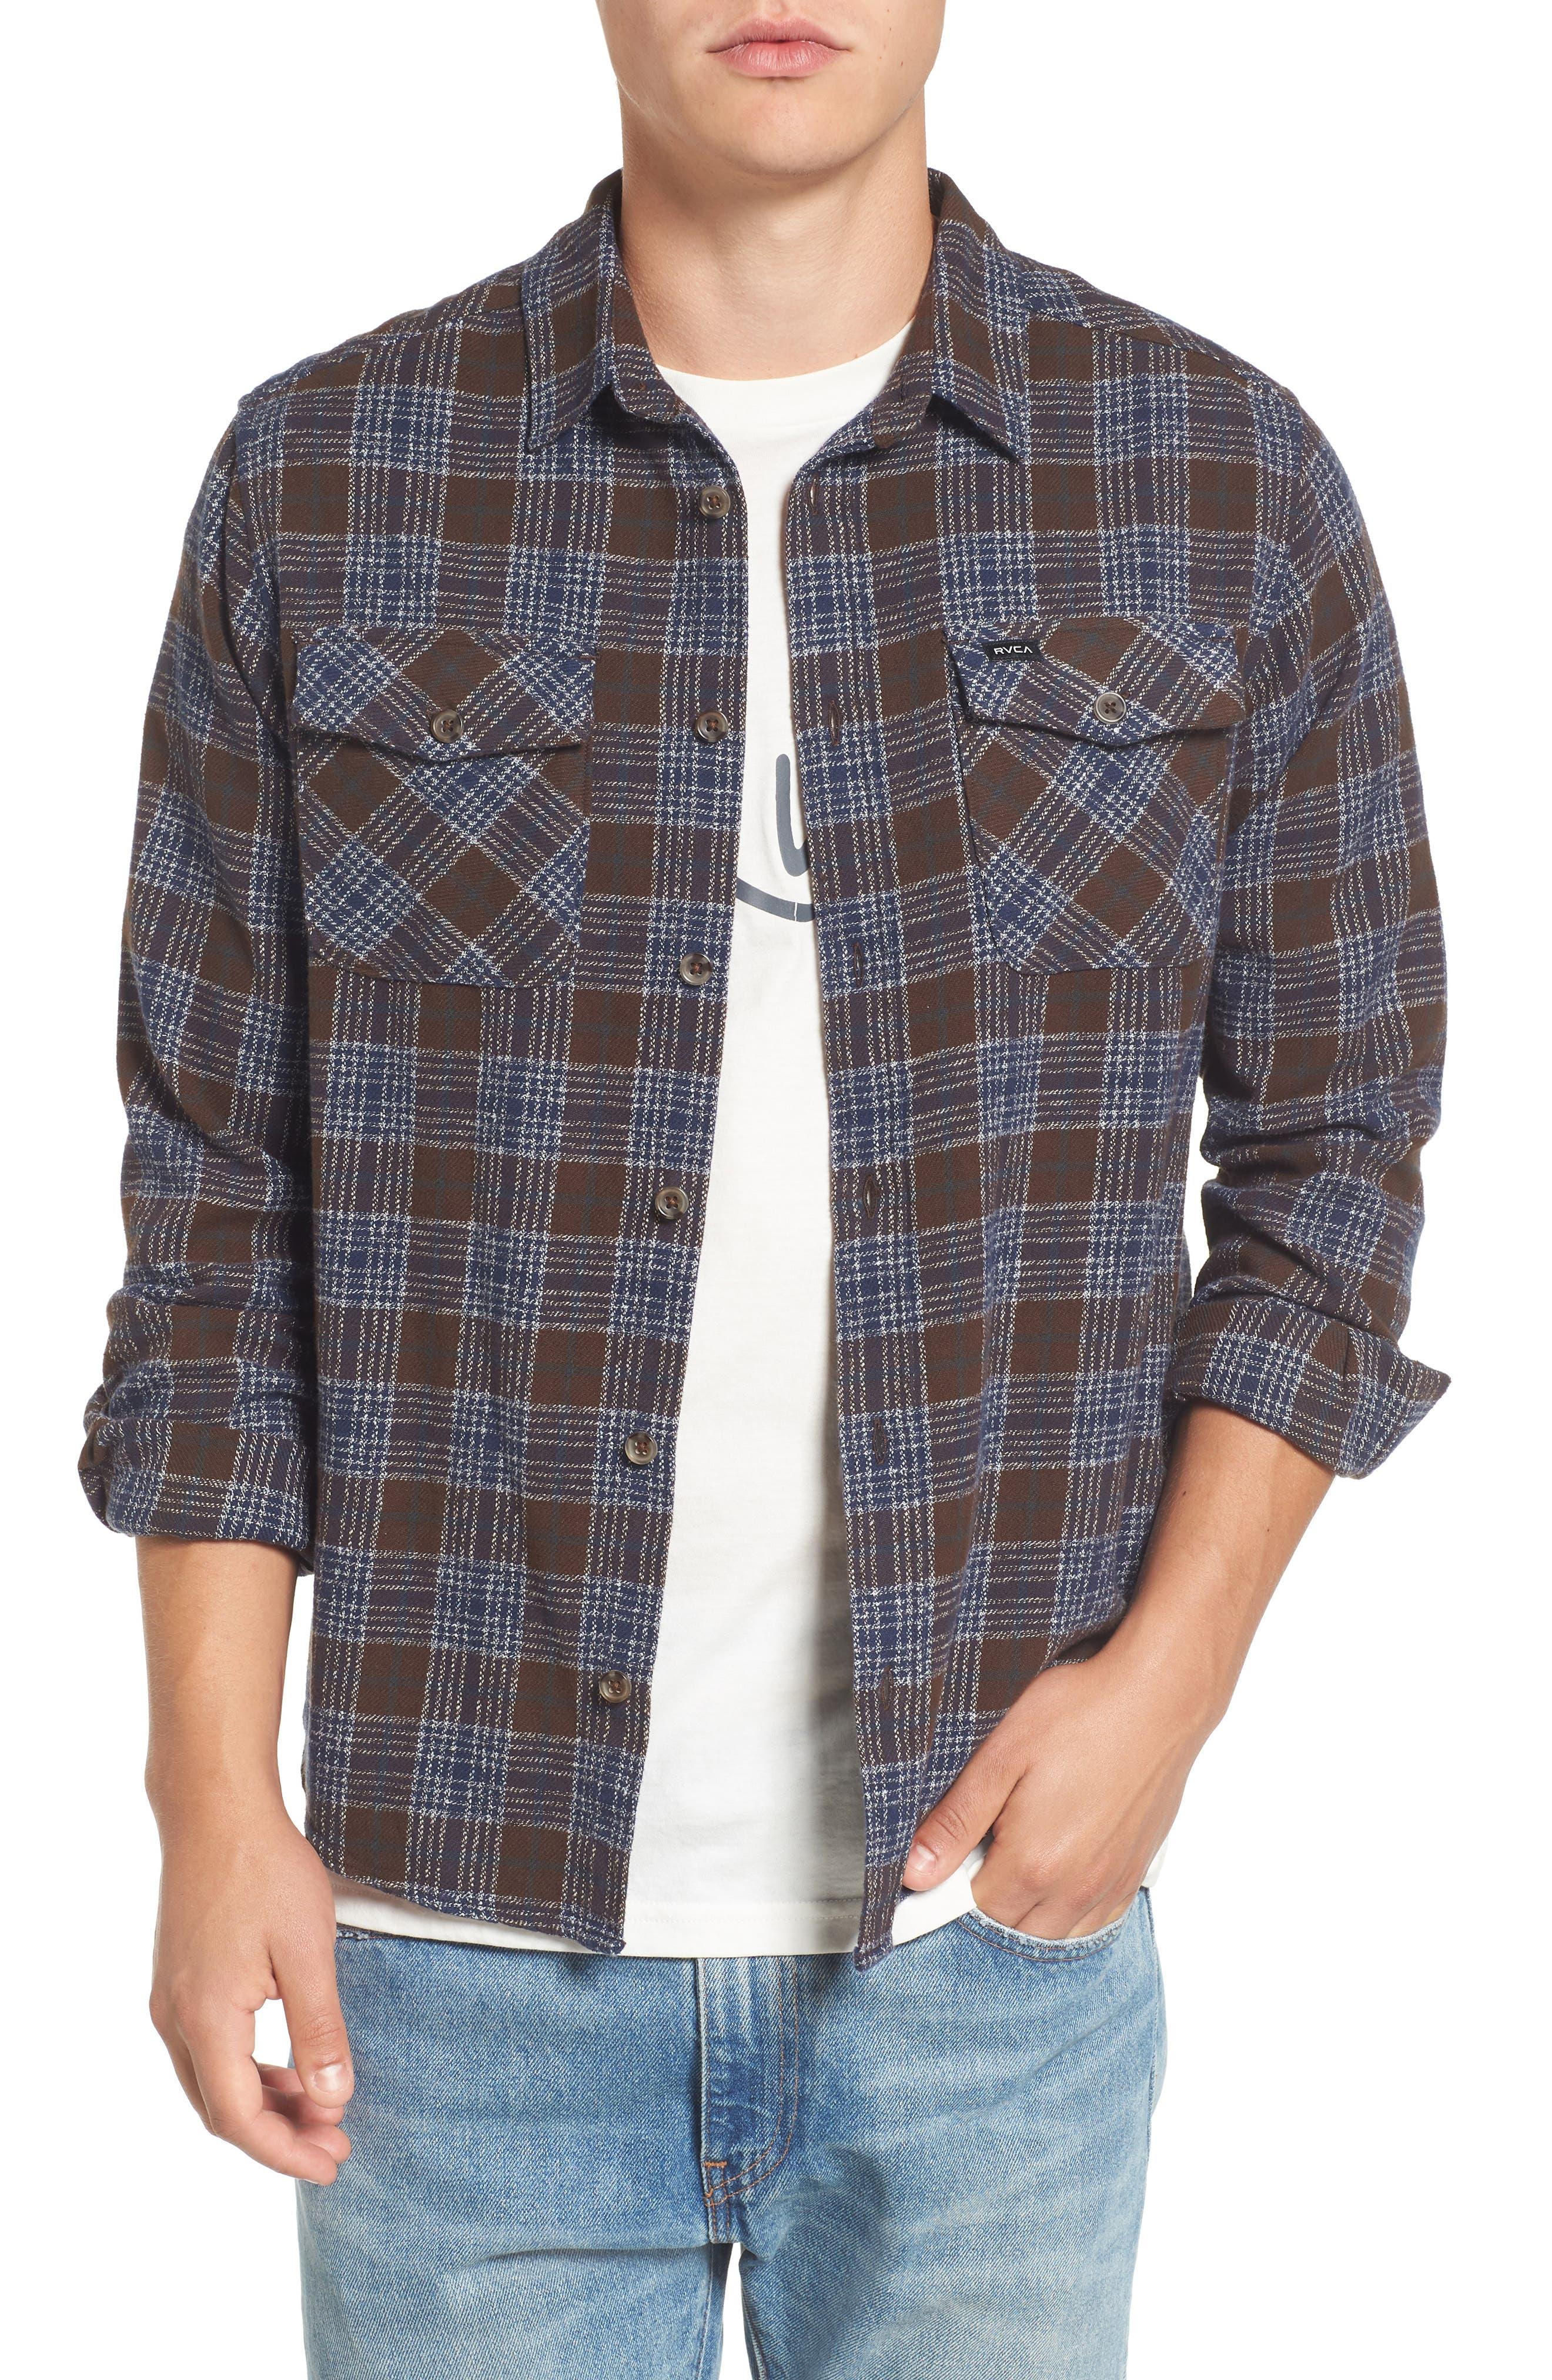 'That'll Work' Trim Fit Plaid Flannel Shirt,                             Alternate thumbnail 10, color,